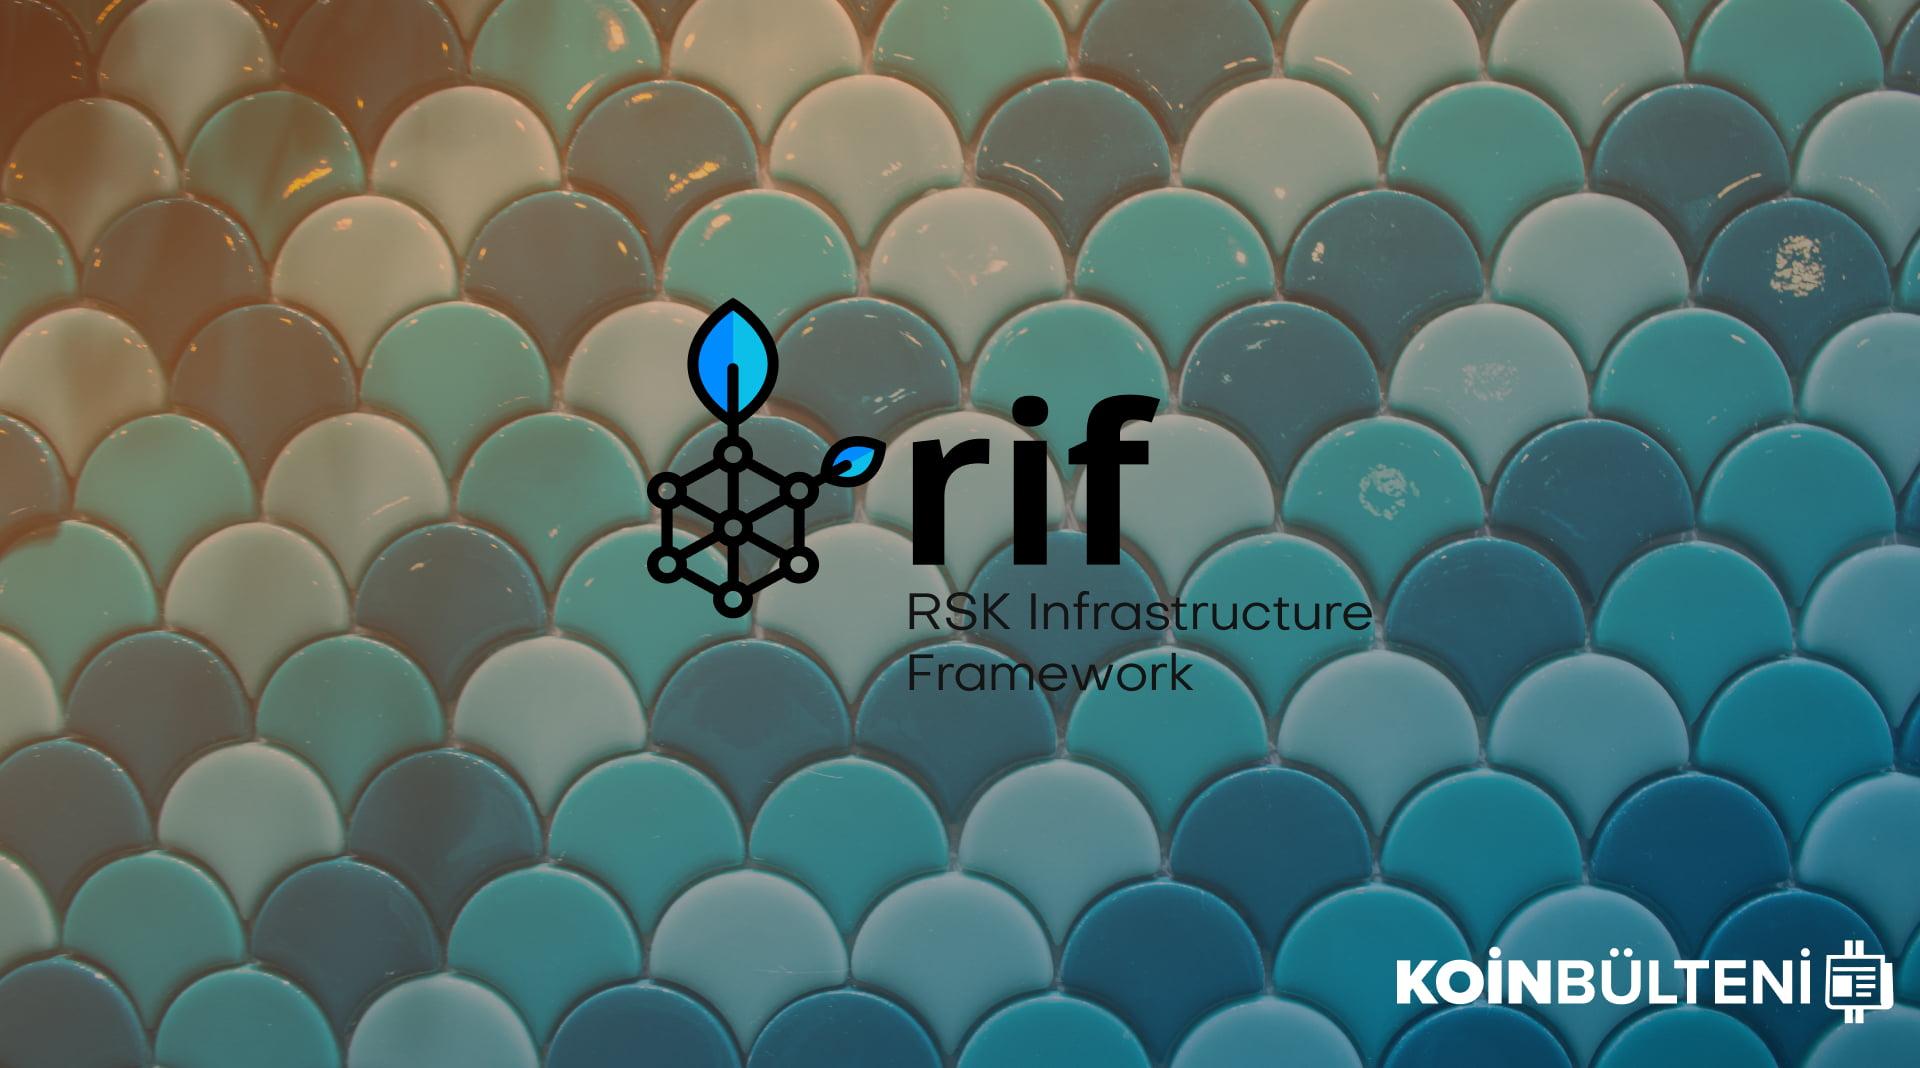 RSK-Infrasturcture-framework-RIF